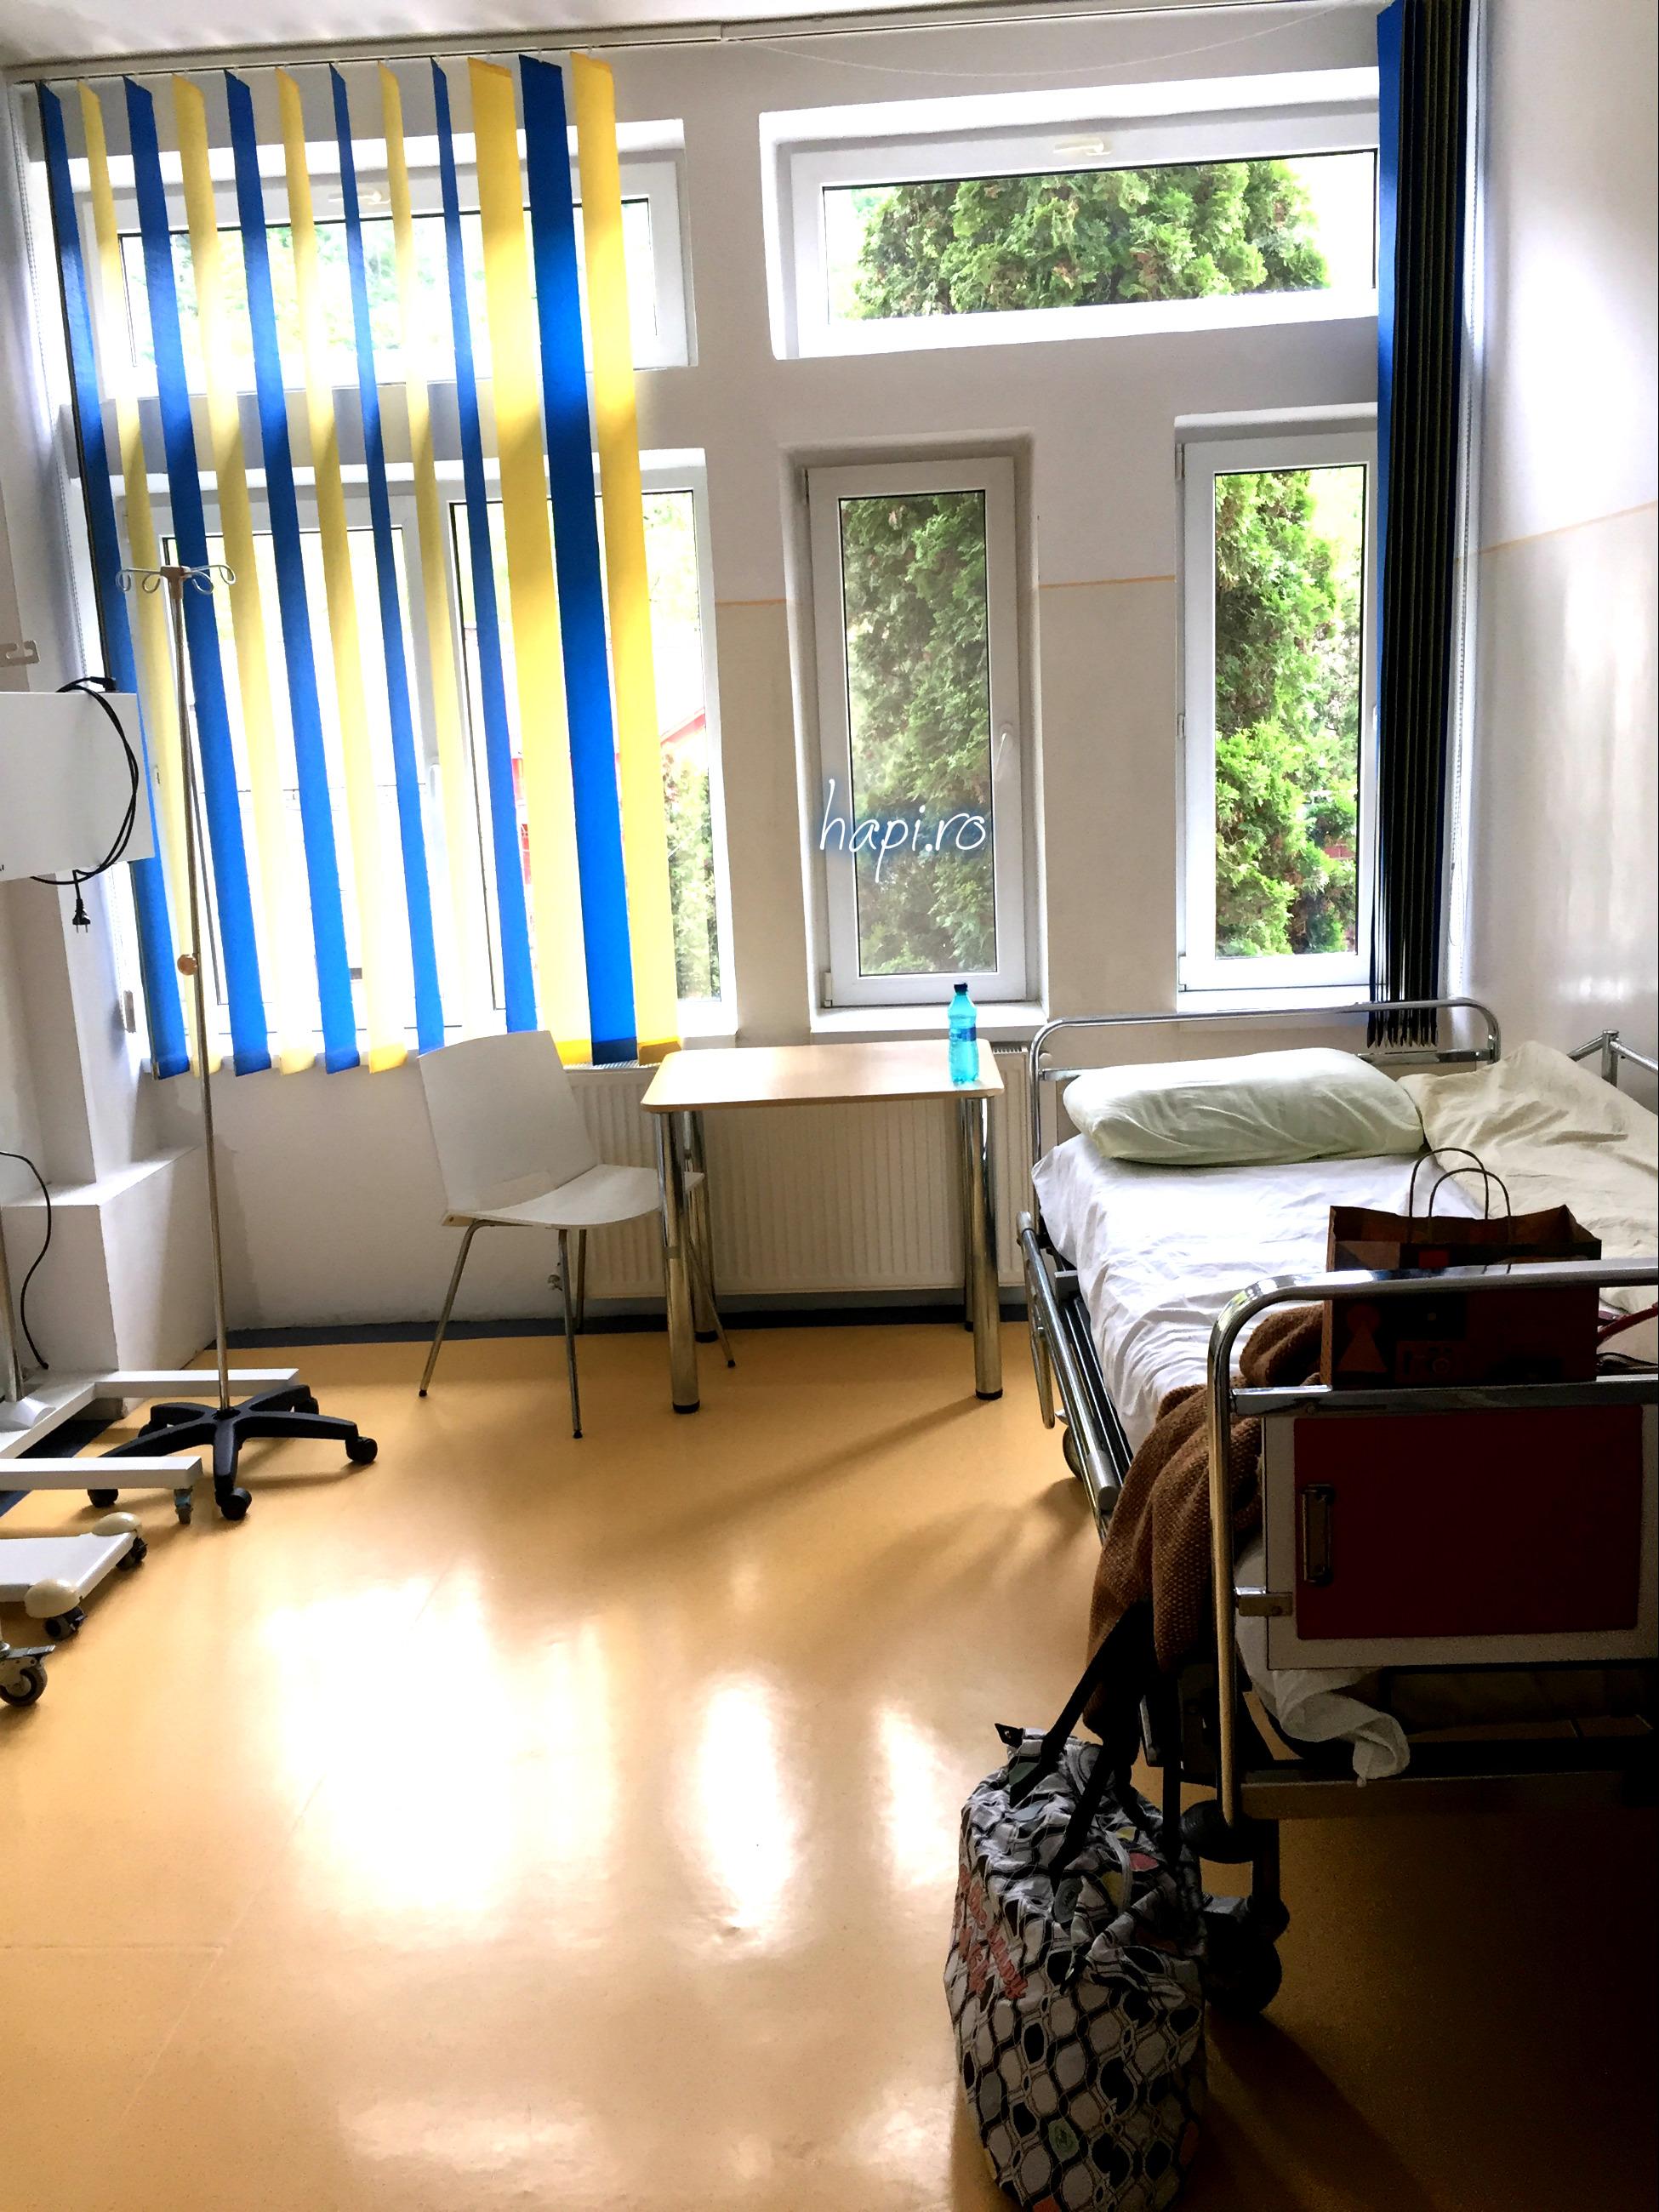 Cezariana lu/ Hapi la Spitalul Municipal Dej